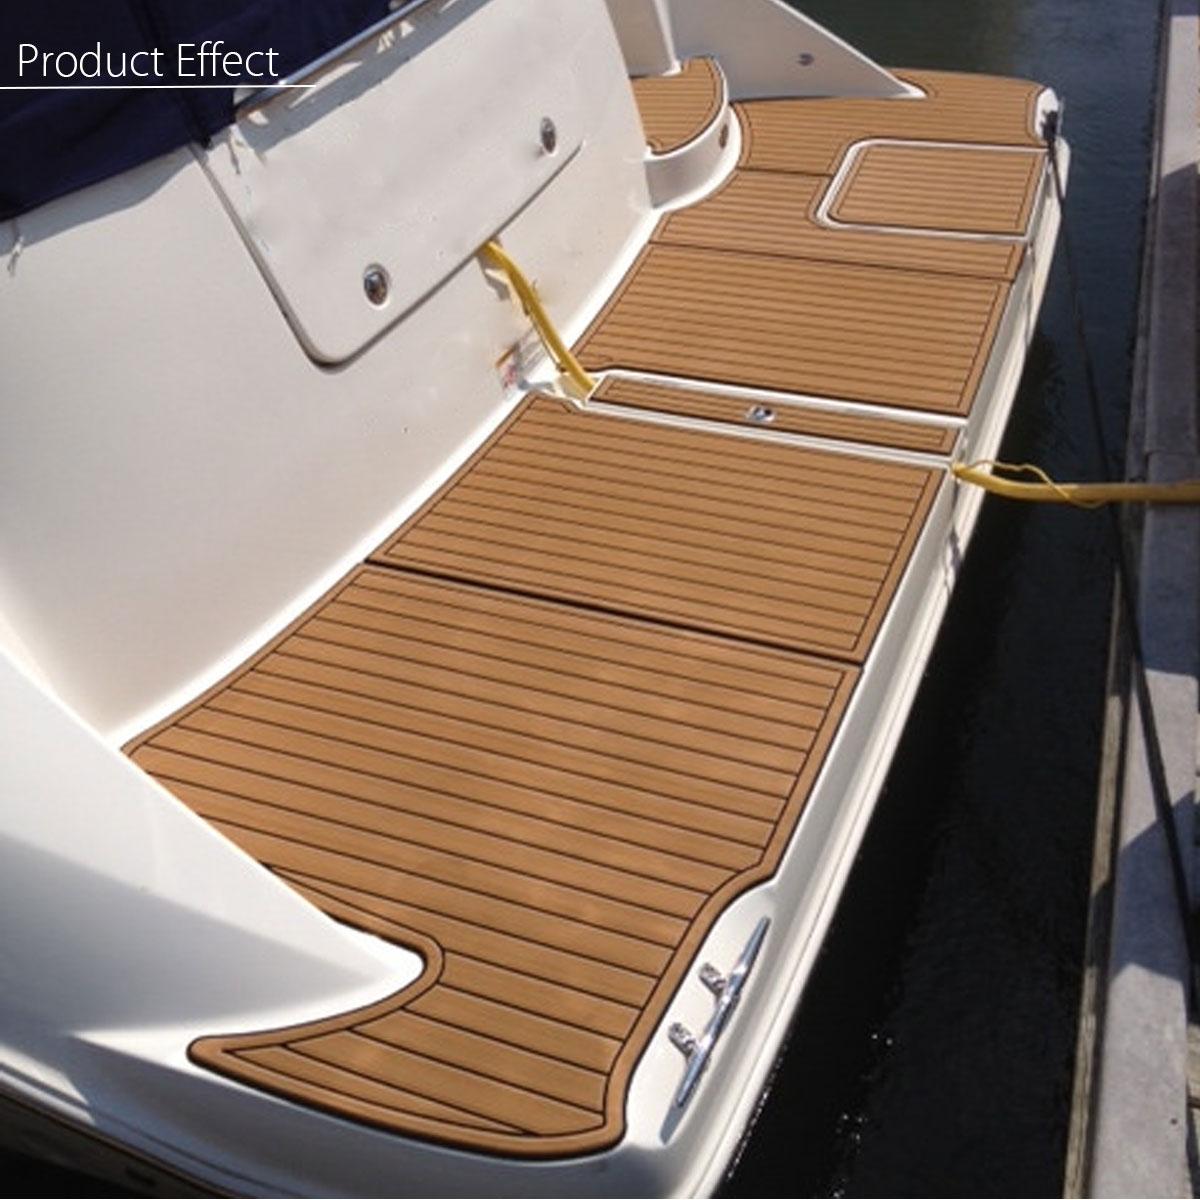 Self Adhesive EVA Foam Faux Teak Sheet Boat Yacht Synthetic Teak Floor Mat RV Parts With Glue Black and Gold 230cm x 90cm x 5mm teak house ваза ingrid